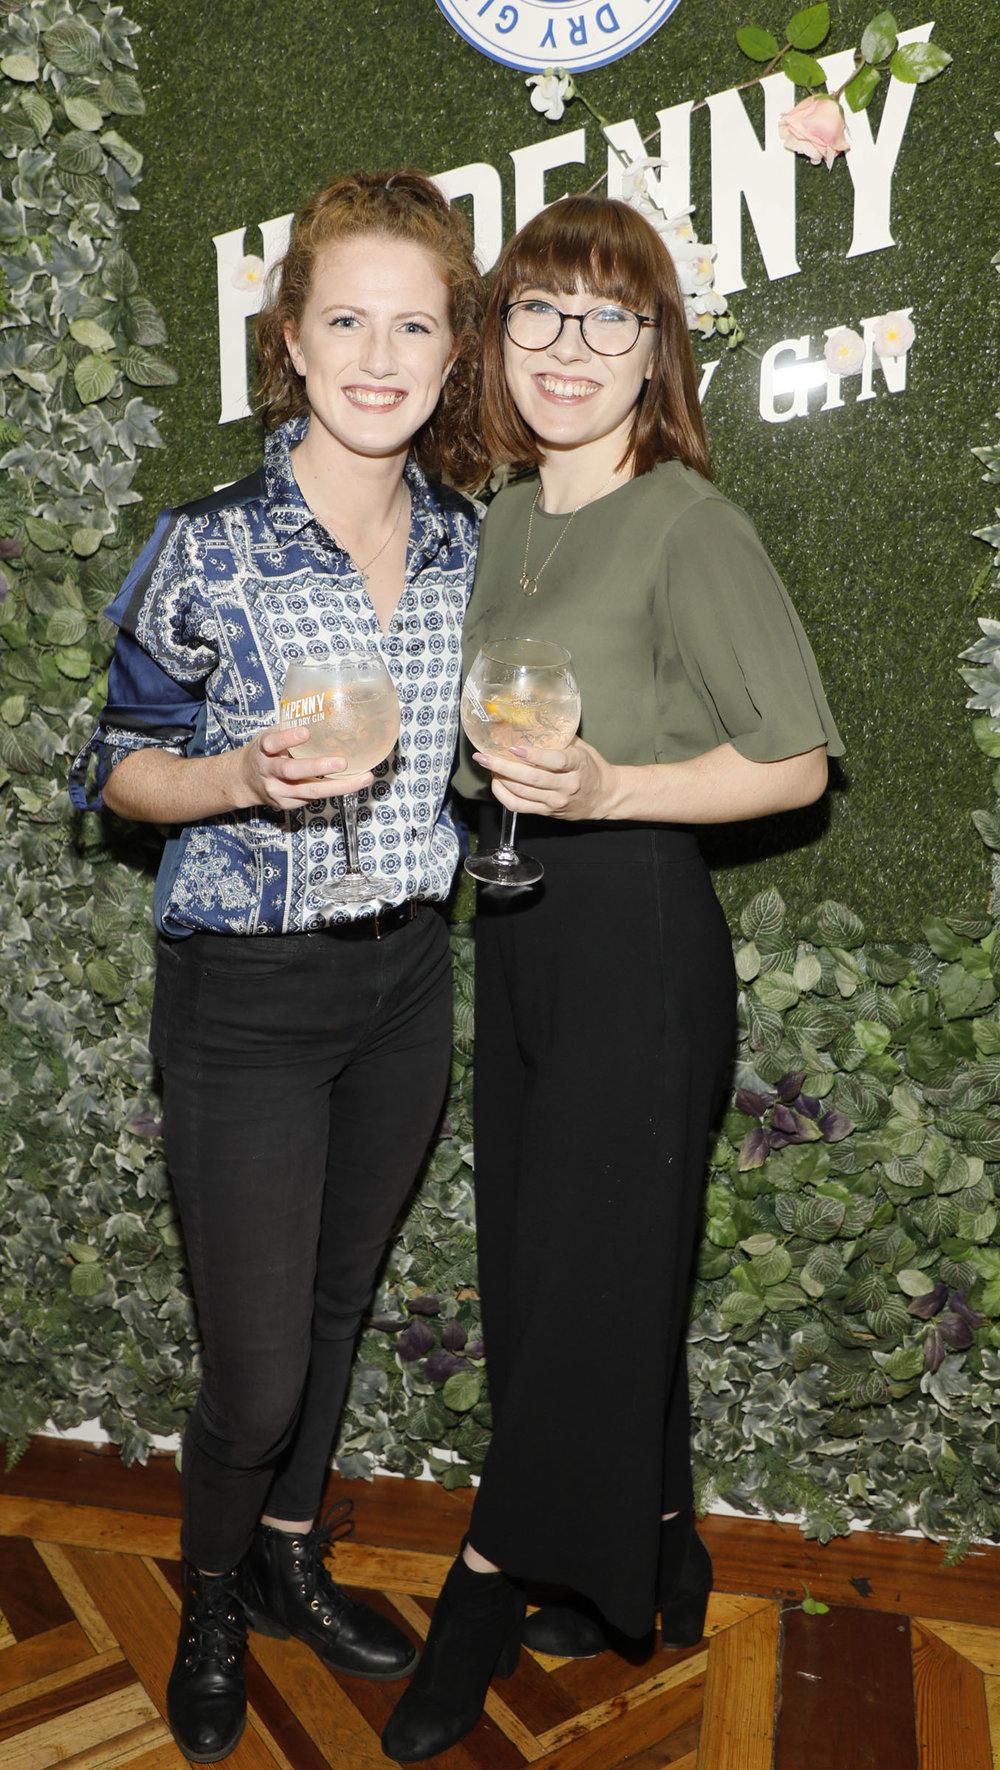 Katie Doyle and Gillian Sullivan at the launch of the Ha'penny Spirits range.jpg